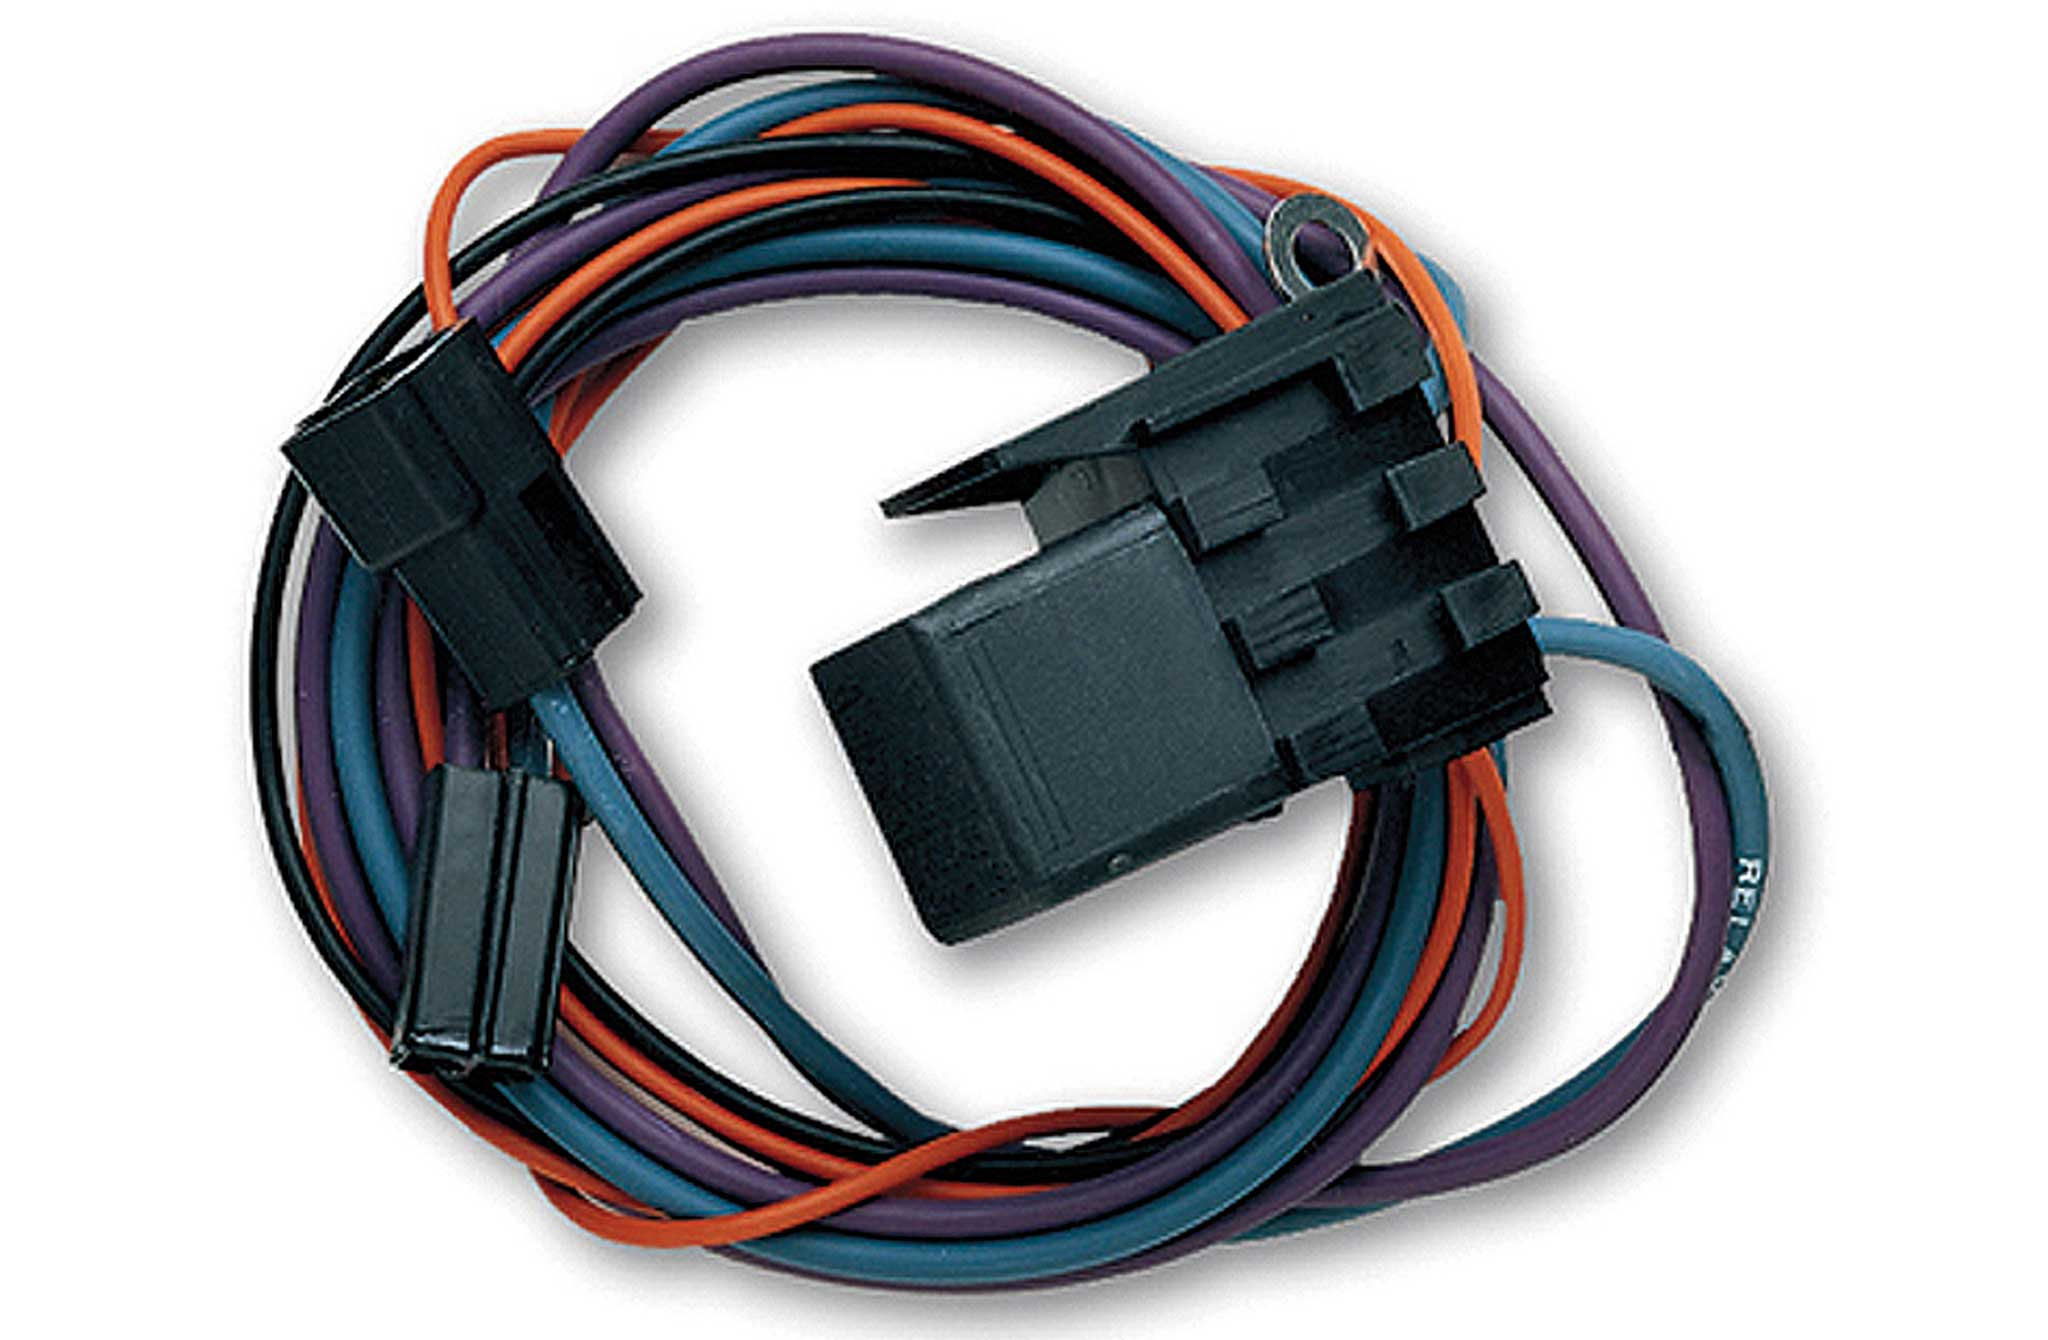 automotive-security-options-ron-francis-wiring-anti-theft ... on dash gauge wiring, 93 f150 wiper wiring, ez wiring, car 2 speed fan wiring, race car switch panel wiring, 700r4 wiring, 79 bronco dash lights wiring, vw cabrio fuel pump wiring, 1964 dodge polara wiring, watson street works wiring, chevy neutral safety switch wiring,